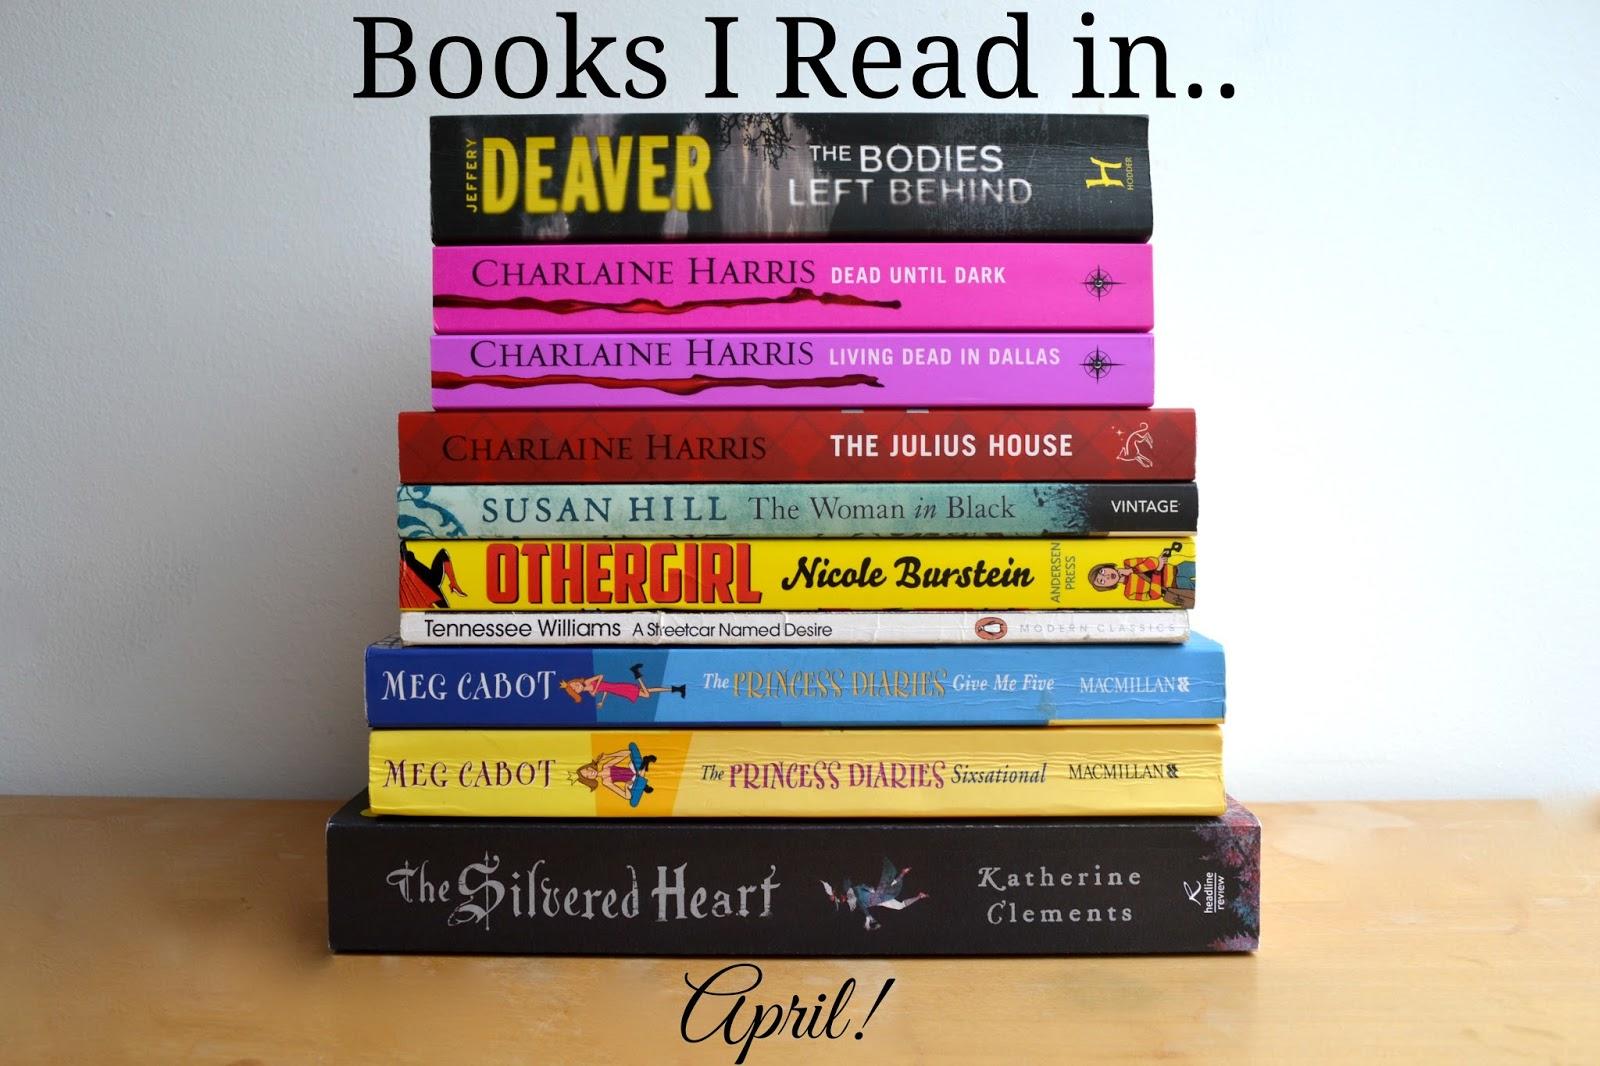 Book pile Jeffery Deaver Charlaine Harris Susan Hill Tennessee Williams Meg Cabot